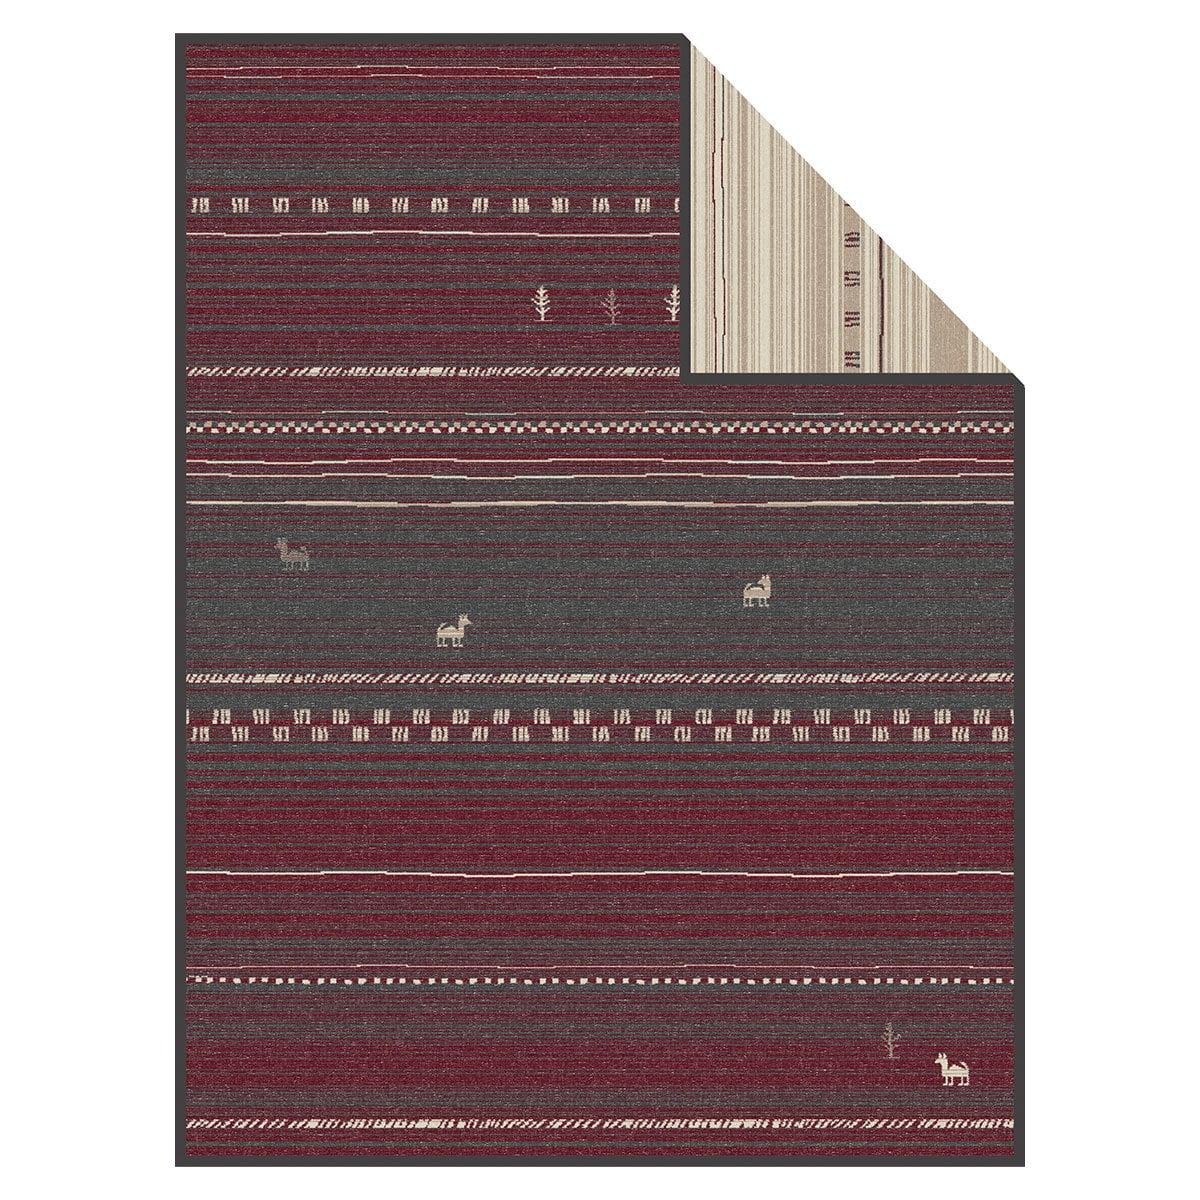 ibena jacquard wohndecke banha grau rot g nstig online kaufen bei bettwaren shop. Black Bedroom Furniture Sets. Home Design Ideas